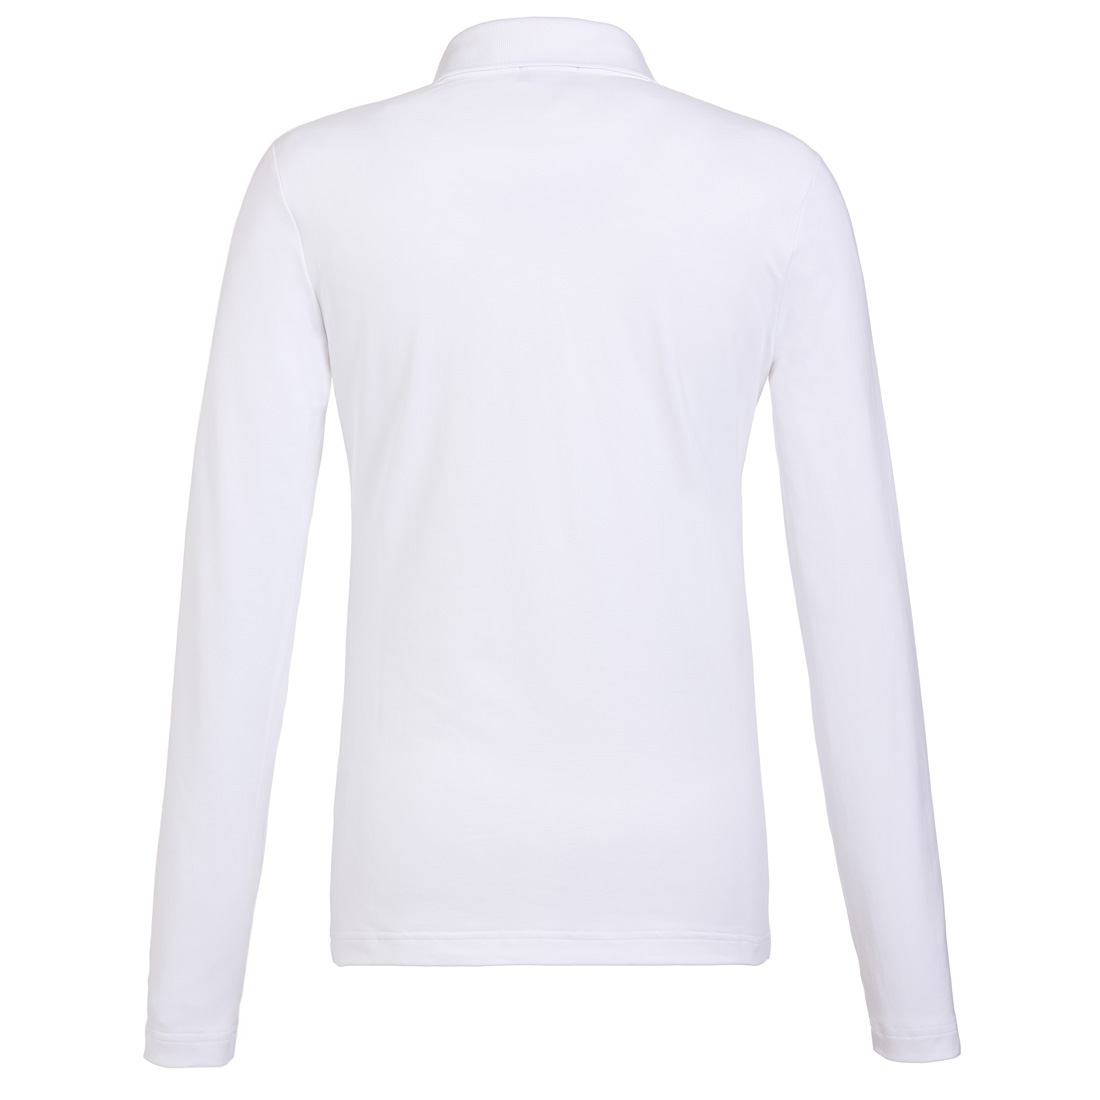 Langarm Golfpolohemd mit Moisture Management und großflächigem Eulen-Print